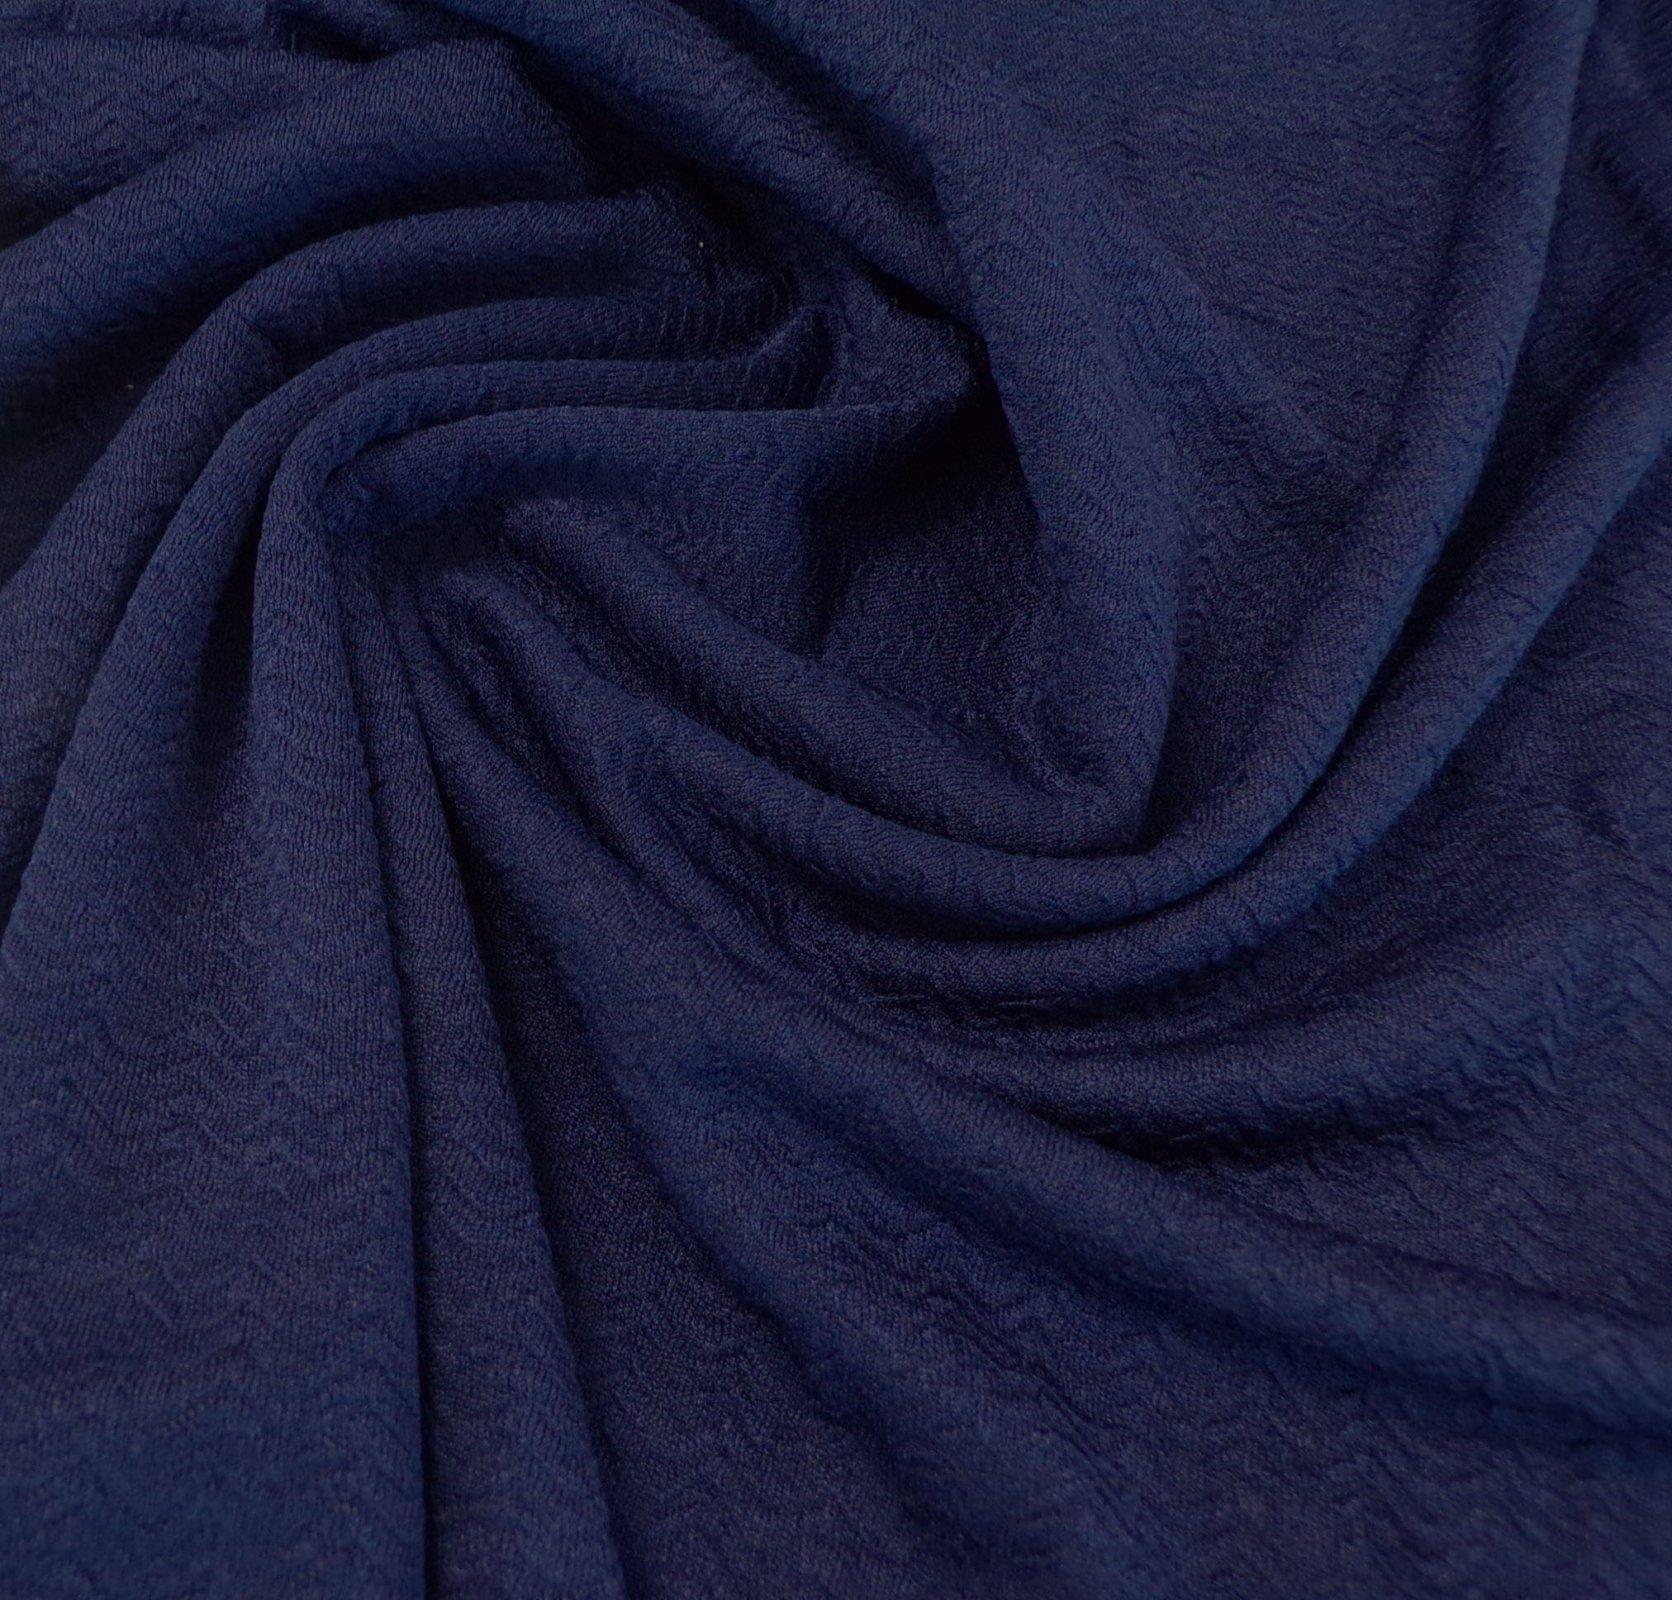 Liverpool Knit - Indigo Herringbone